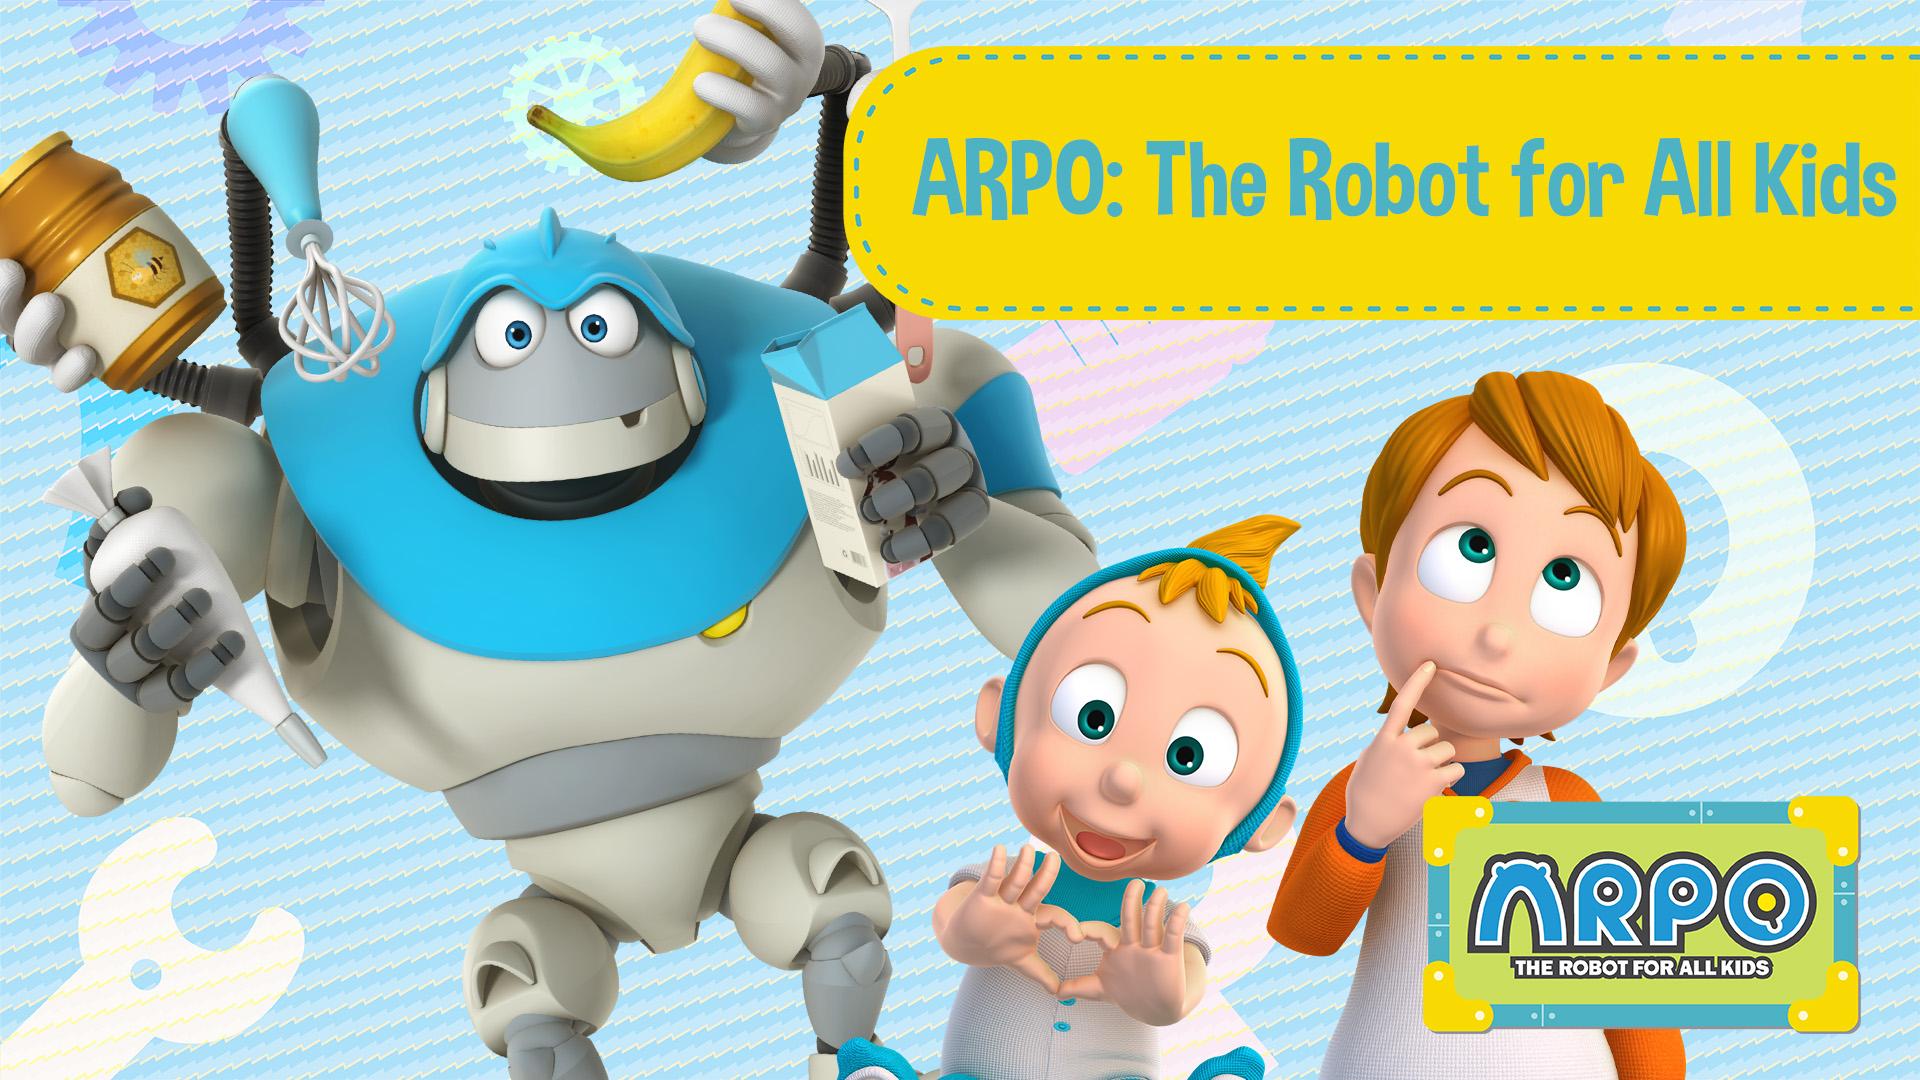 Arpo: The Robot for All Kids - Season 1